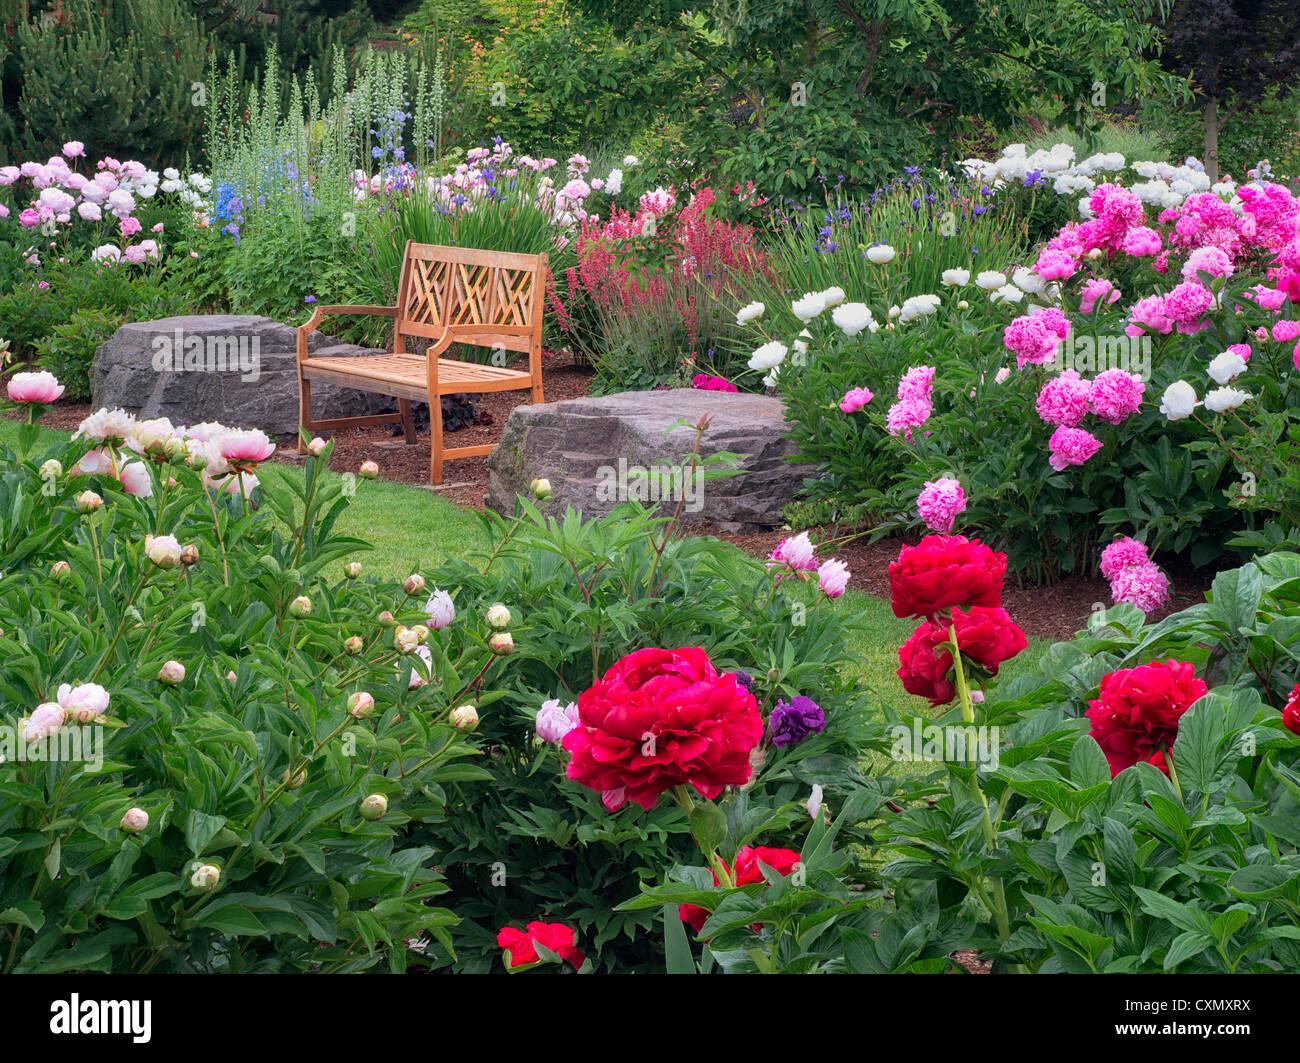 Peony Garden And Bench Adleman Peony Garden Salem Oregon Stock Photo Royalty Free Image